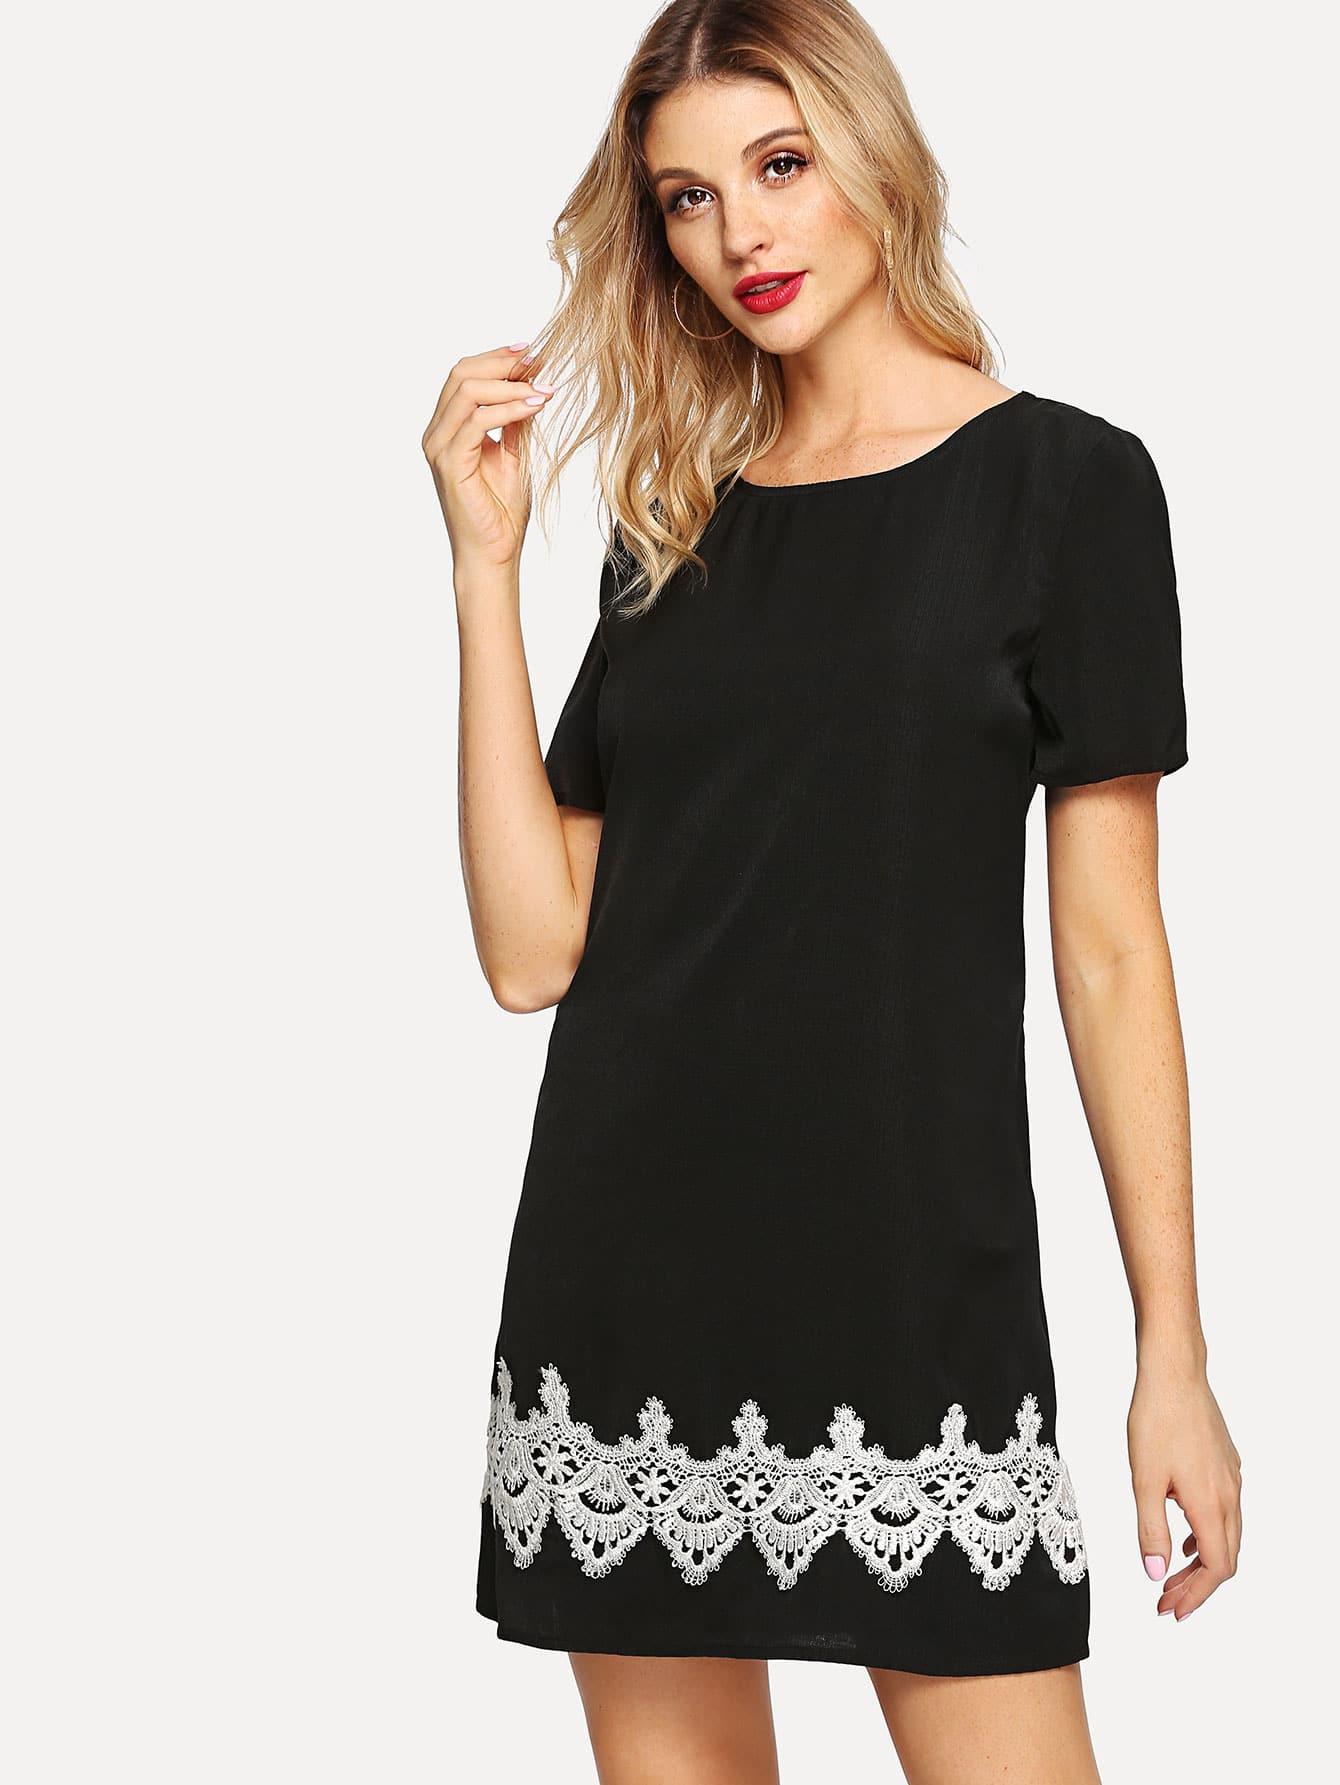 Lace Appliques Short Sleeve Dress vestido de festa curto mini lace short homecoming dresses 2018 tulle appliques v шея бальное платье lace up 8 й класс формальные платья